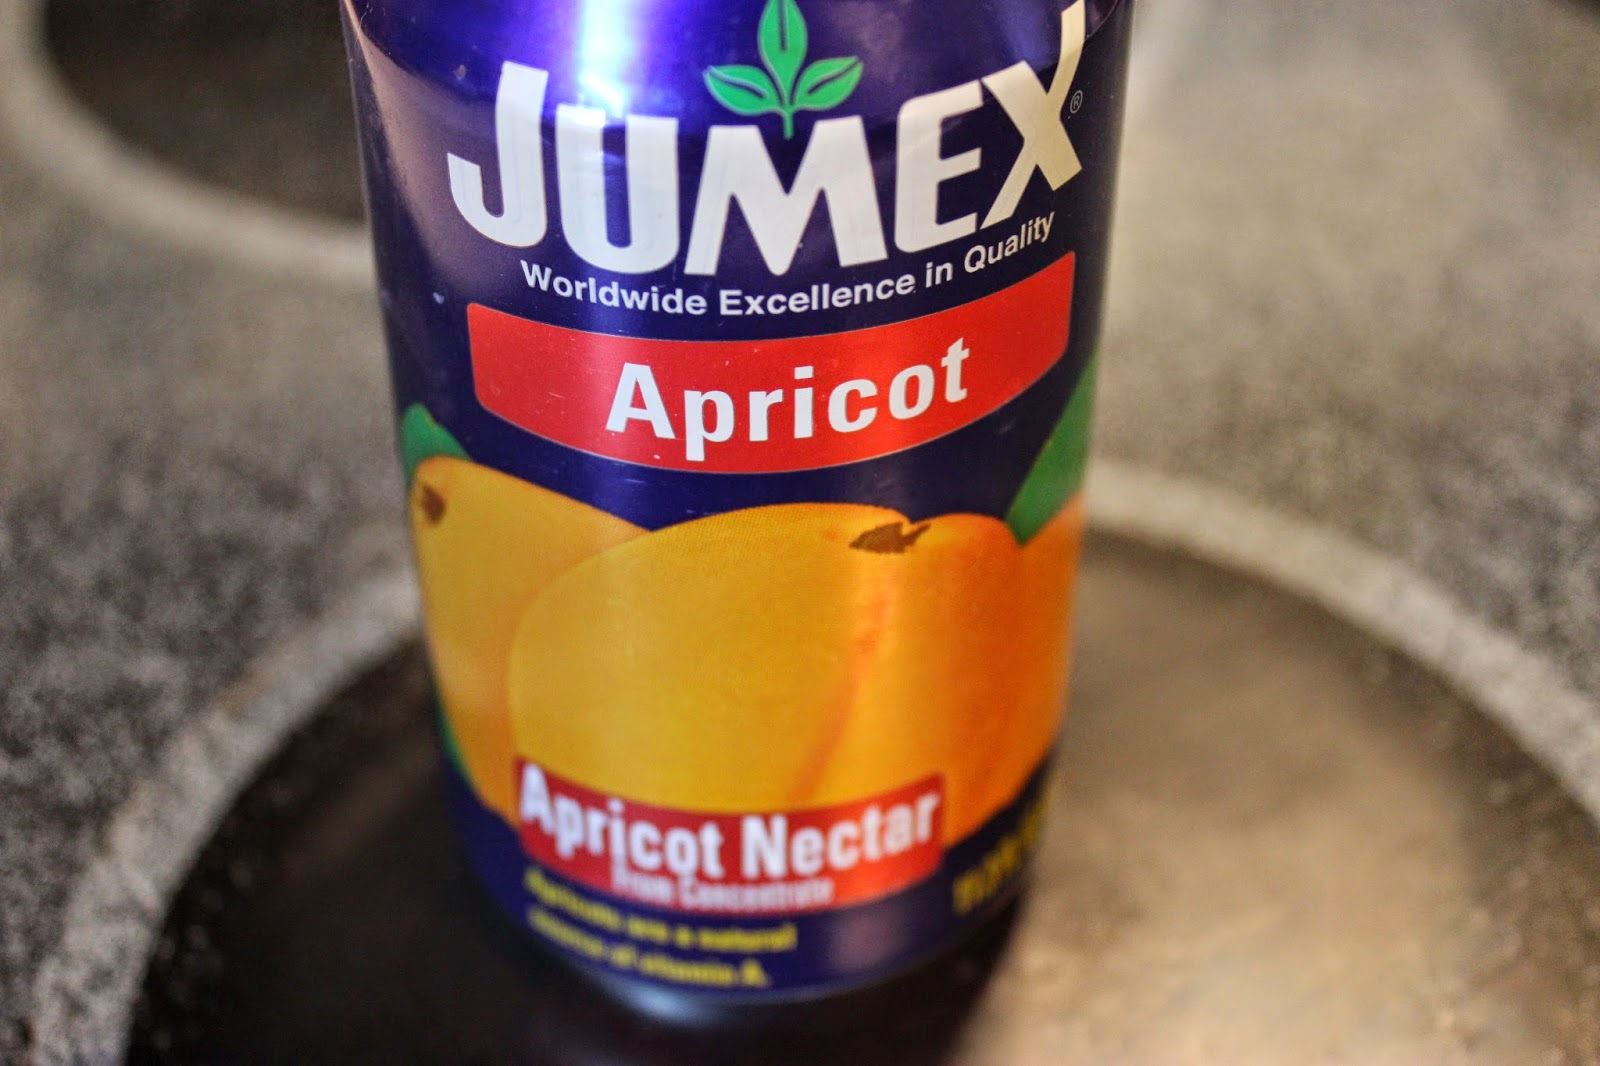 Apricot Nectar Cake Recipe Lemon Jello: Sweet Tea And Cornbread: Apricot Nectar Cake